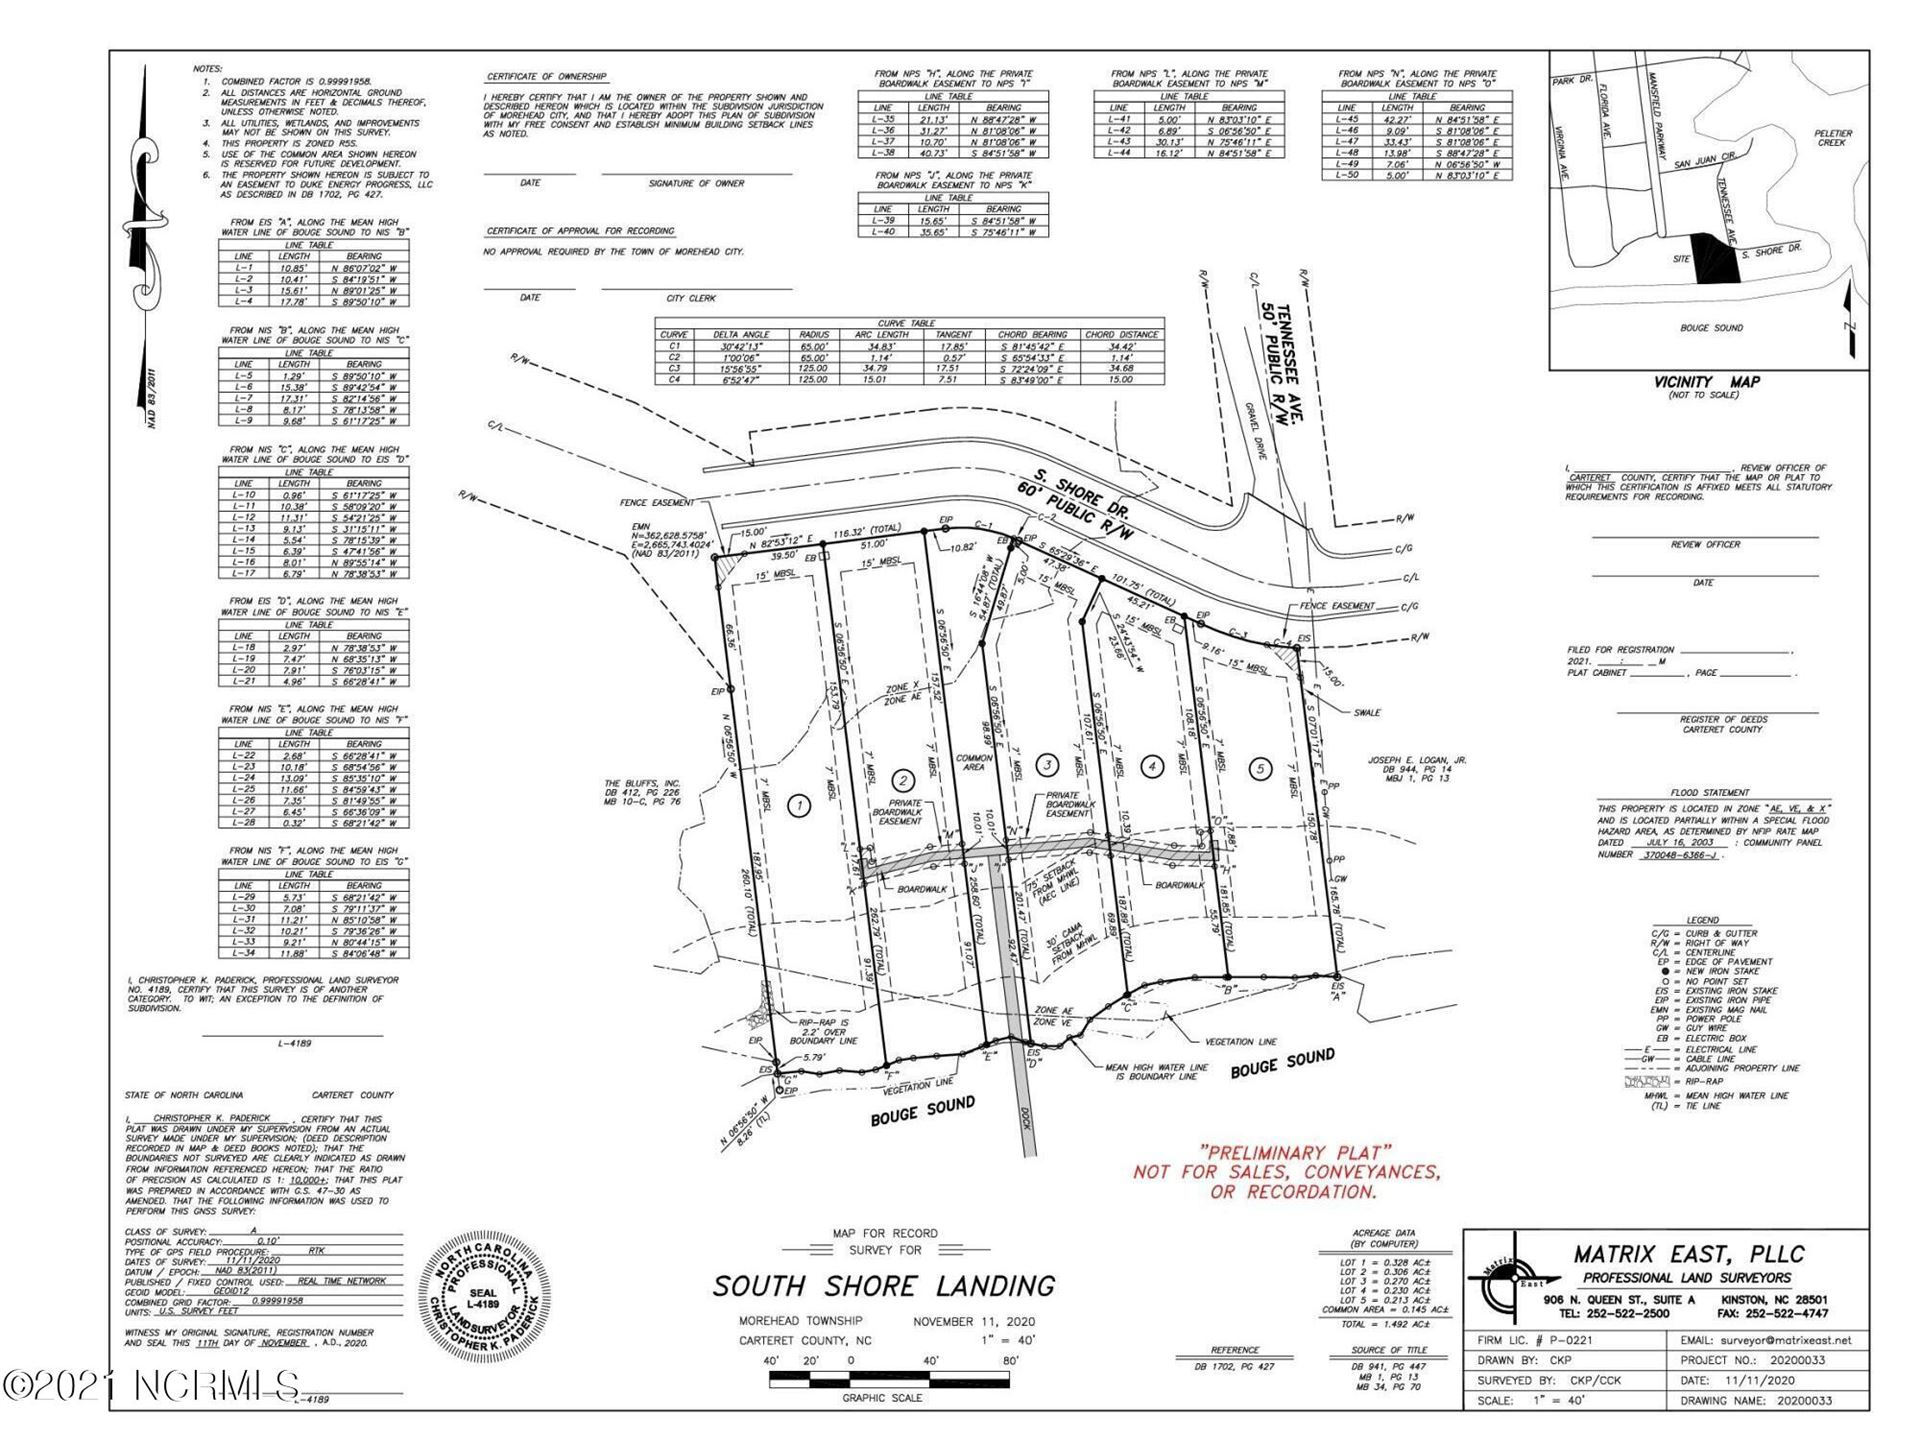 Photo of 4707 Lot 4 South Shore Drive, Morehead City, NC 28557 (MLS # 100284980)